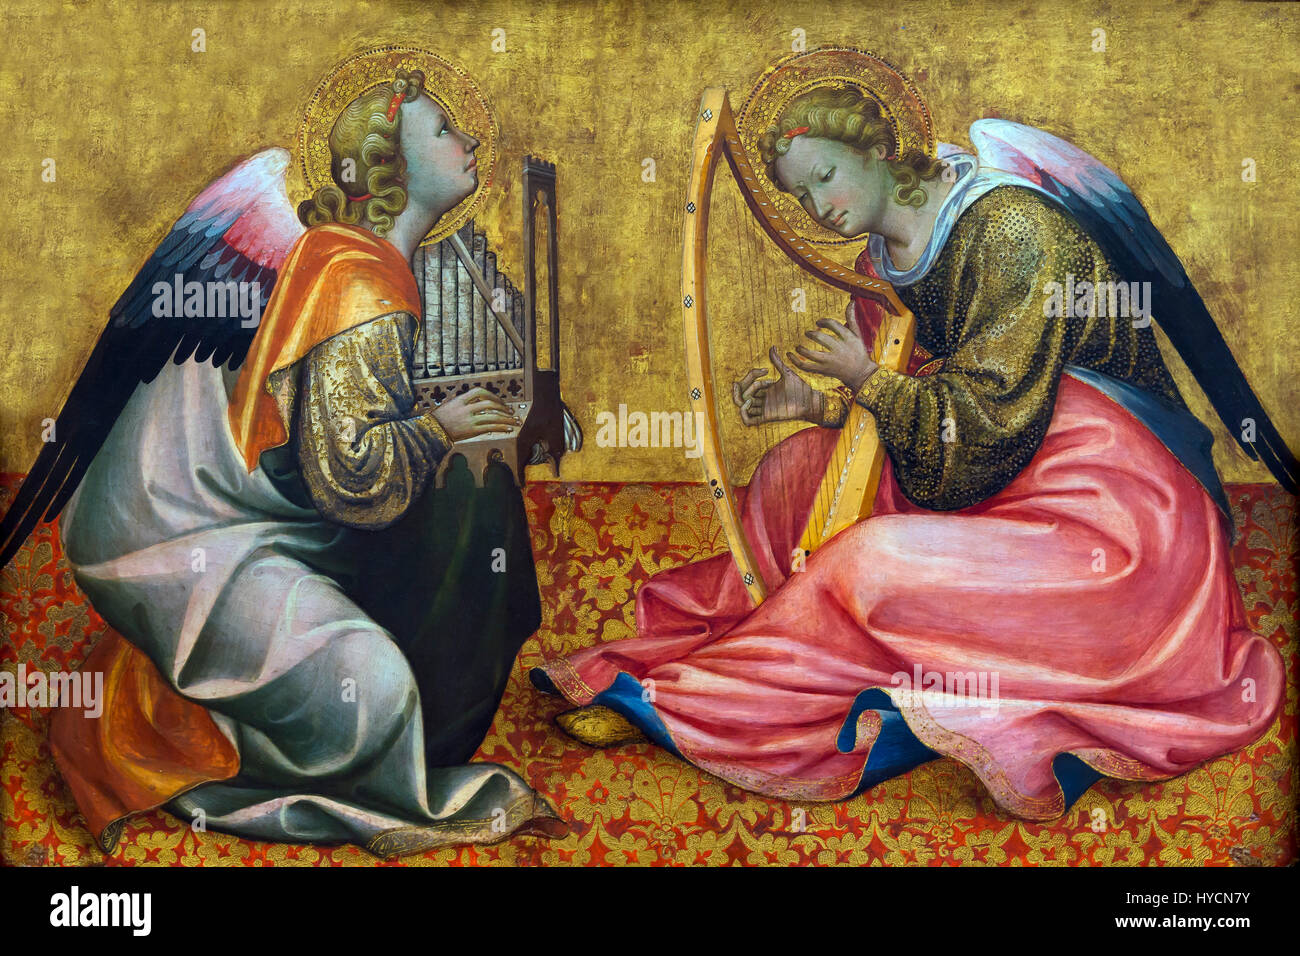 Two Seated Angels Making Music, by Gherardo Starnina, 1400-1410, Boijmans van Beuningen Museum, Rotterdam, Netherlands, - Stock Image